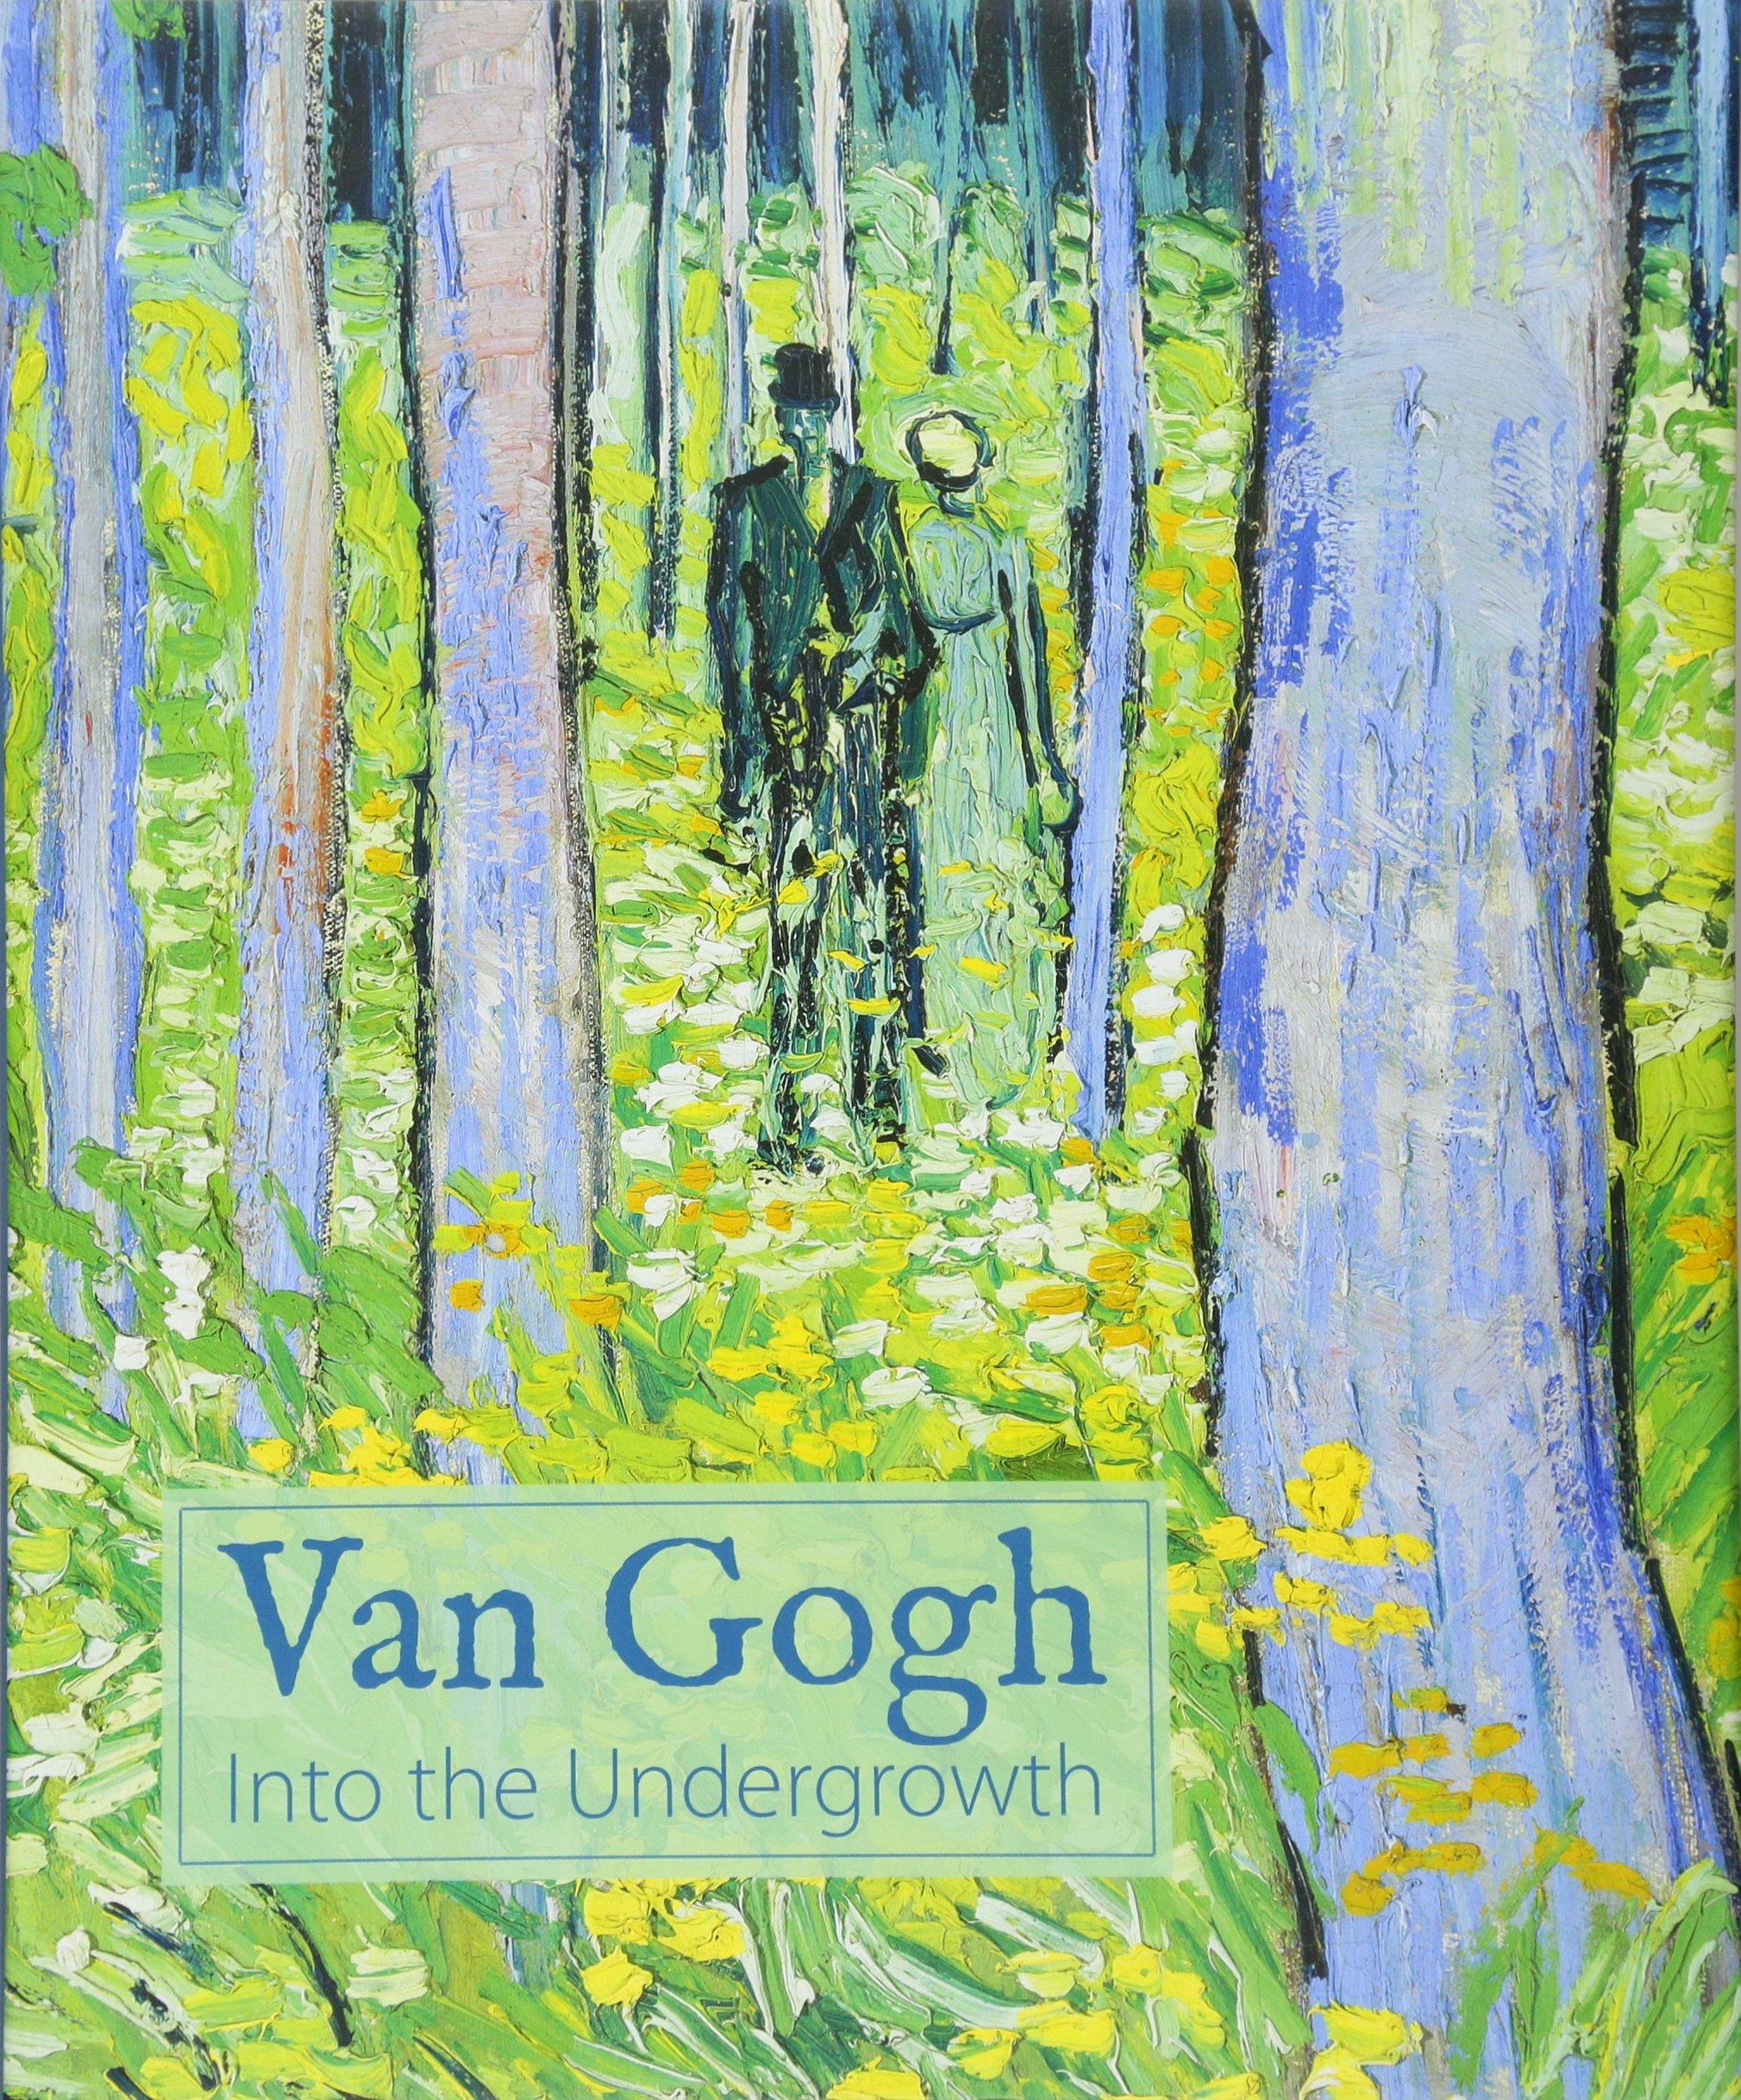 Van Gogh: Into the Undergrowth PDF